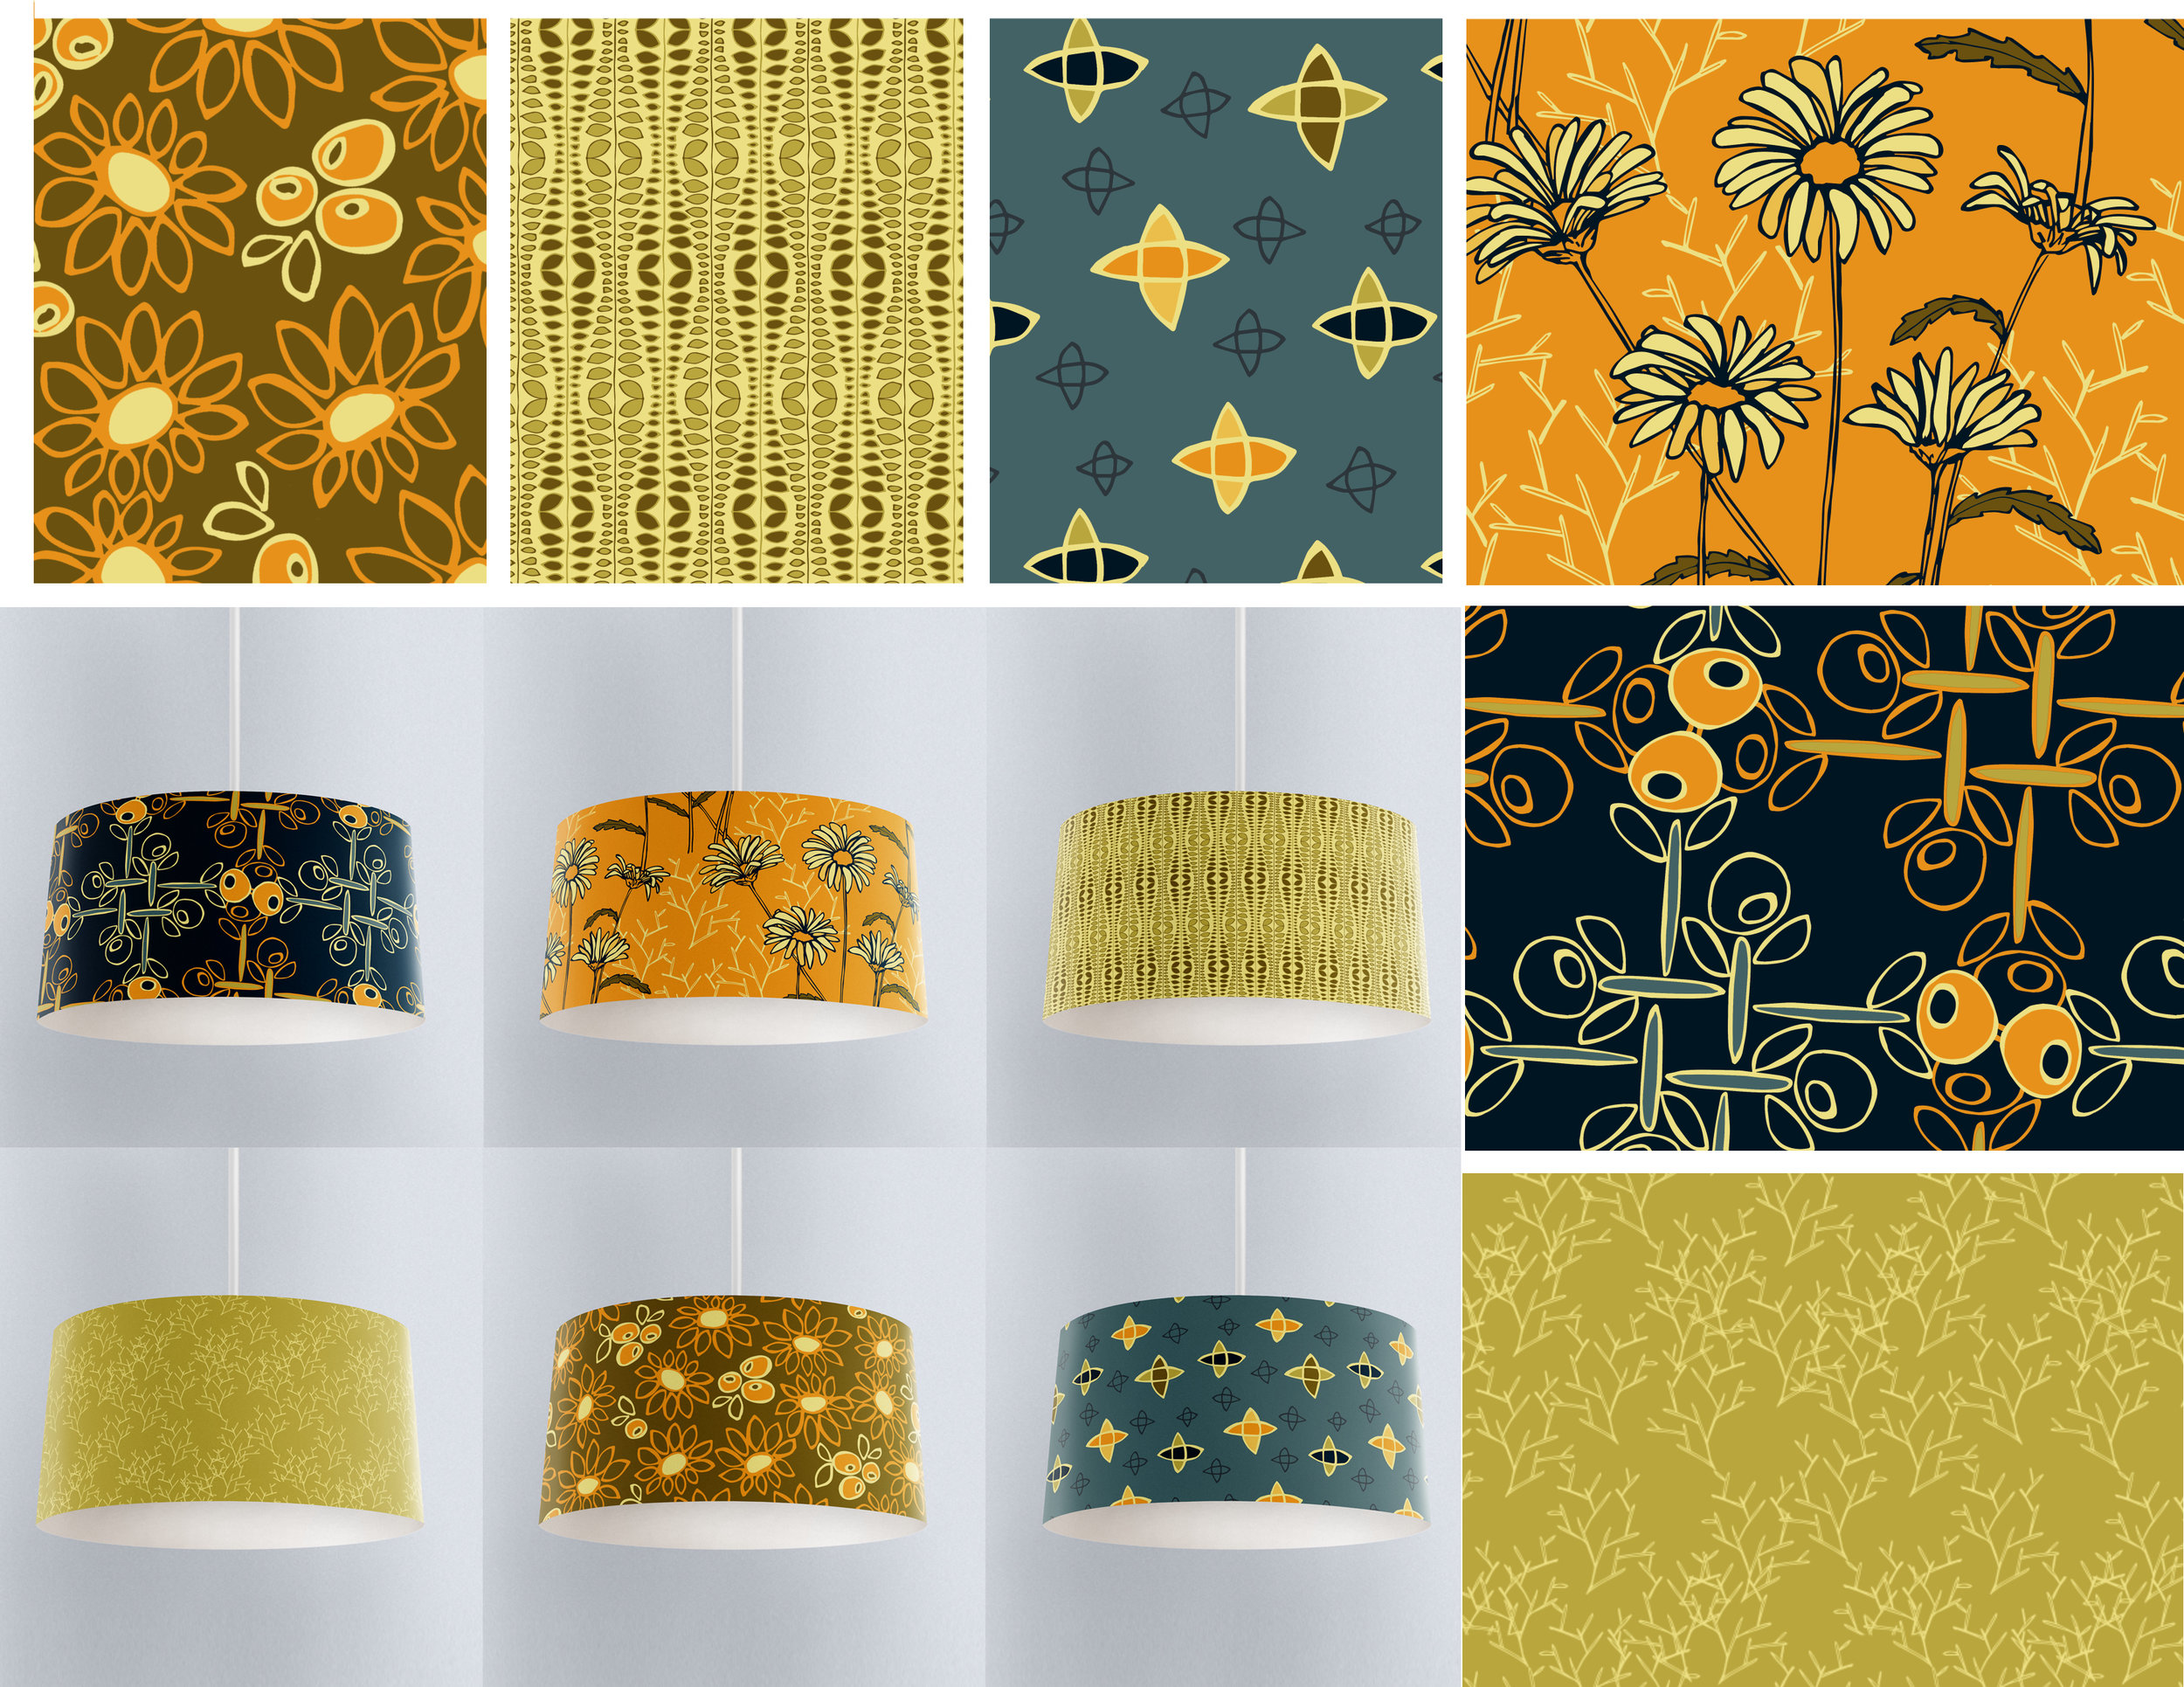 9 Daisy Chain patterned mockups2.jpg